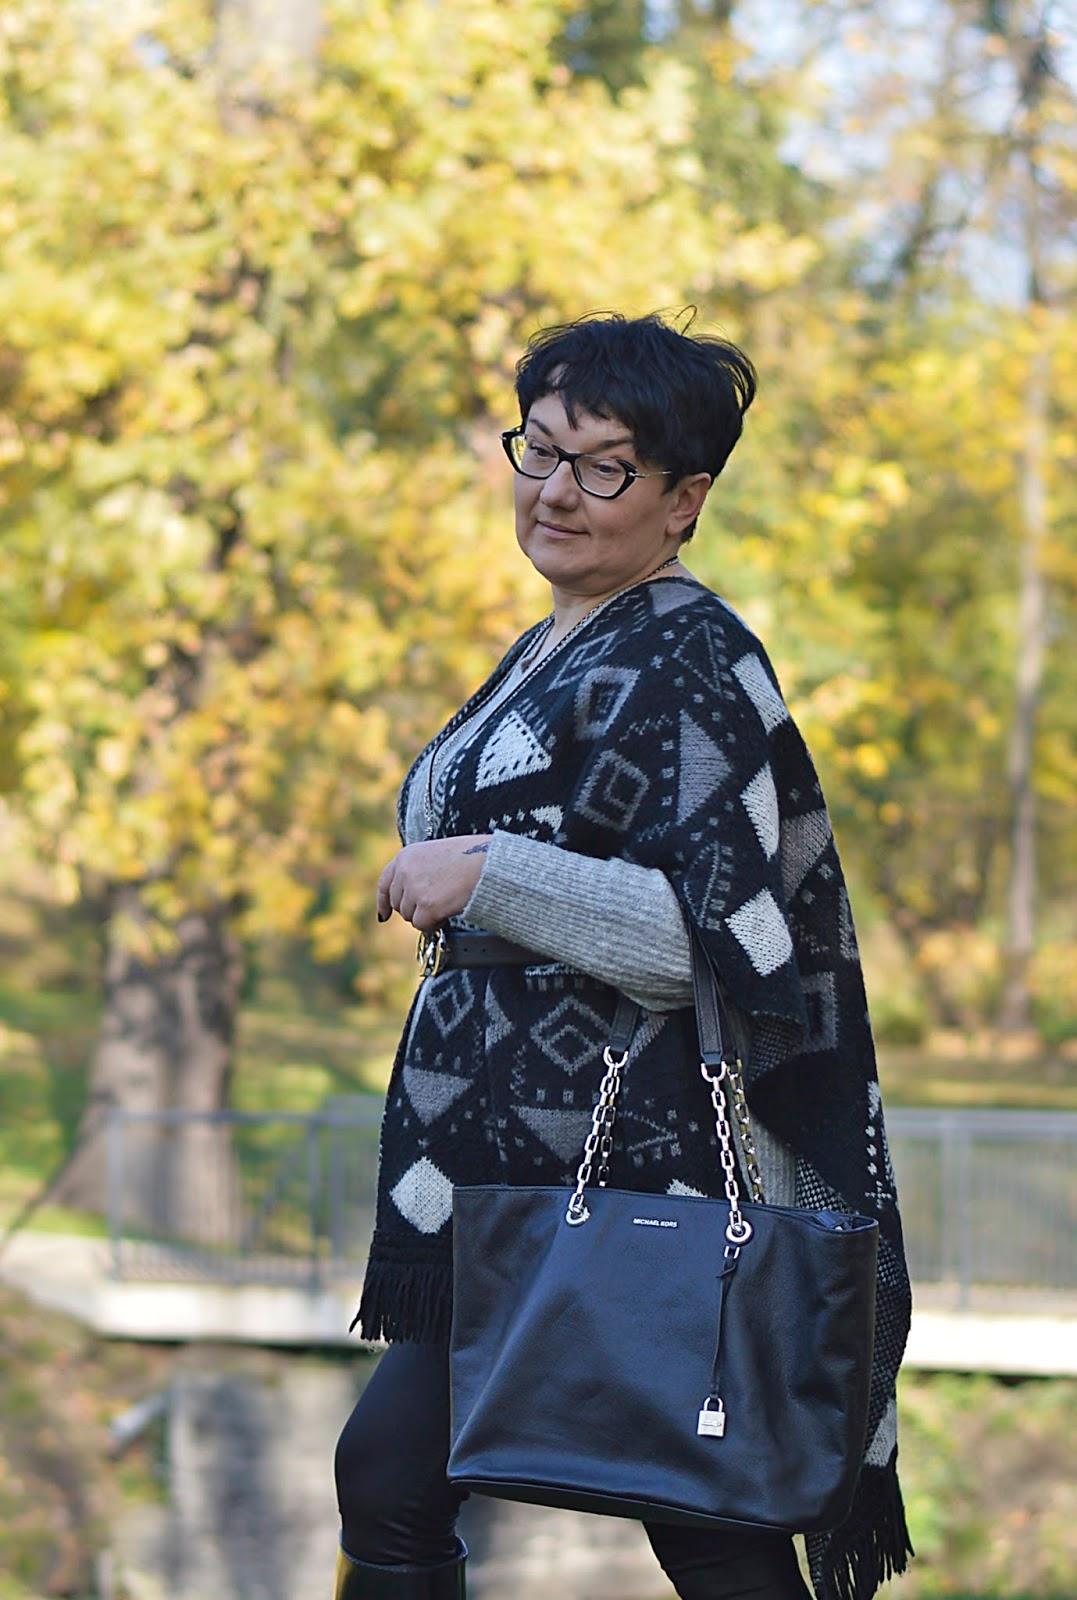 Michael Kors shopper, poncho, autumn